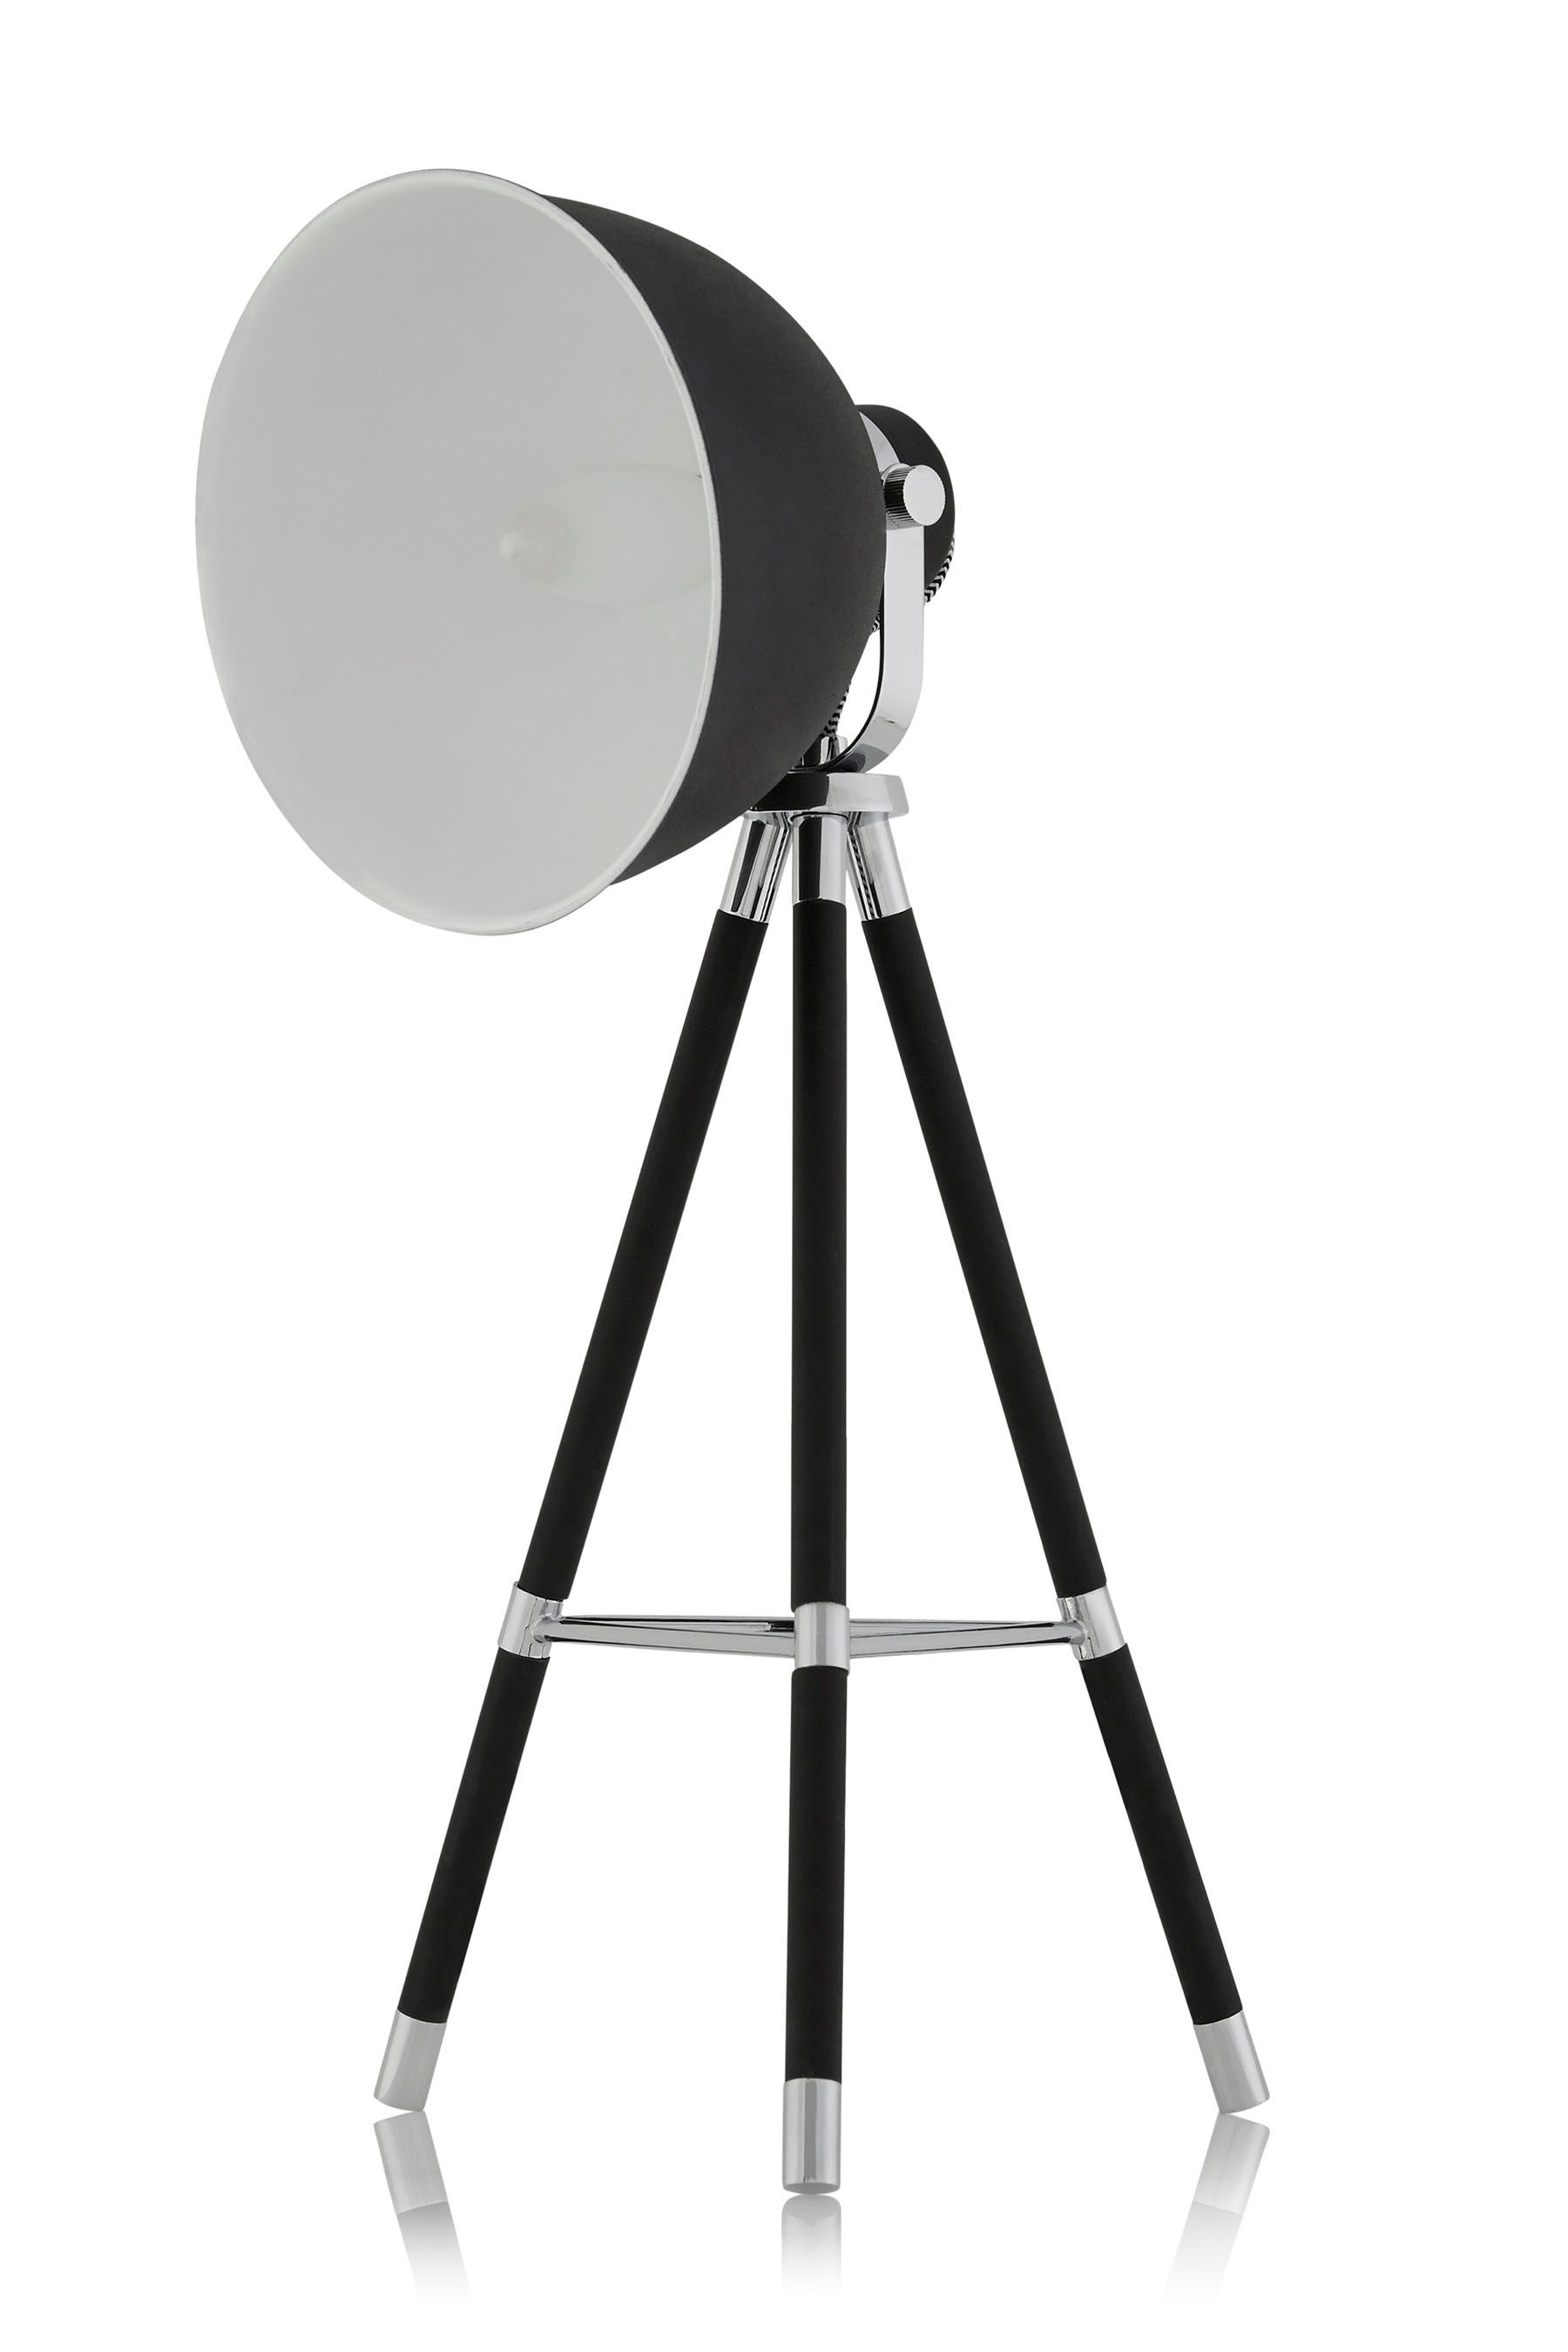 Buy Studio Textured Black And Chrome Tripod Table Lamp ...